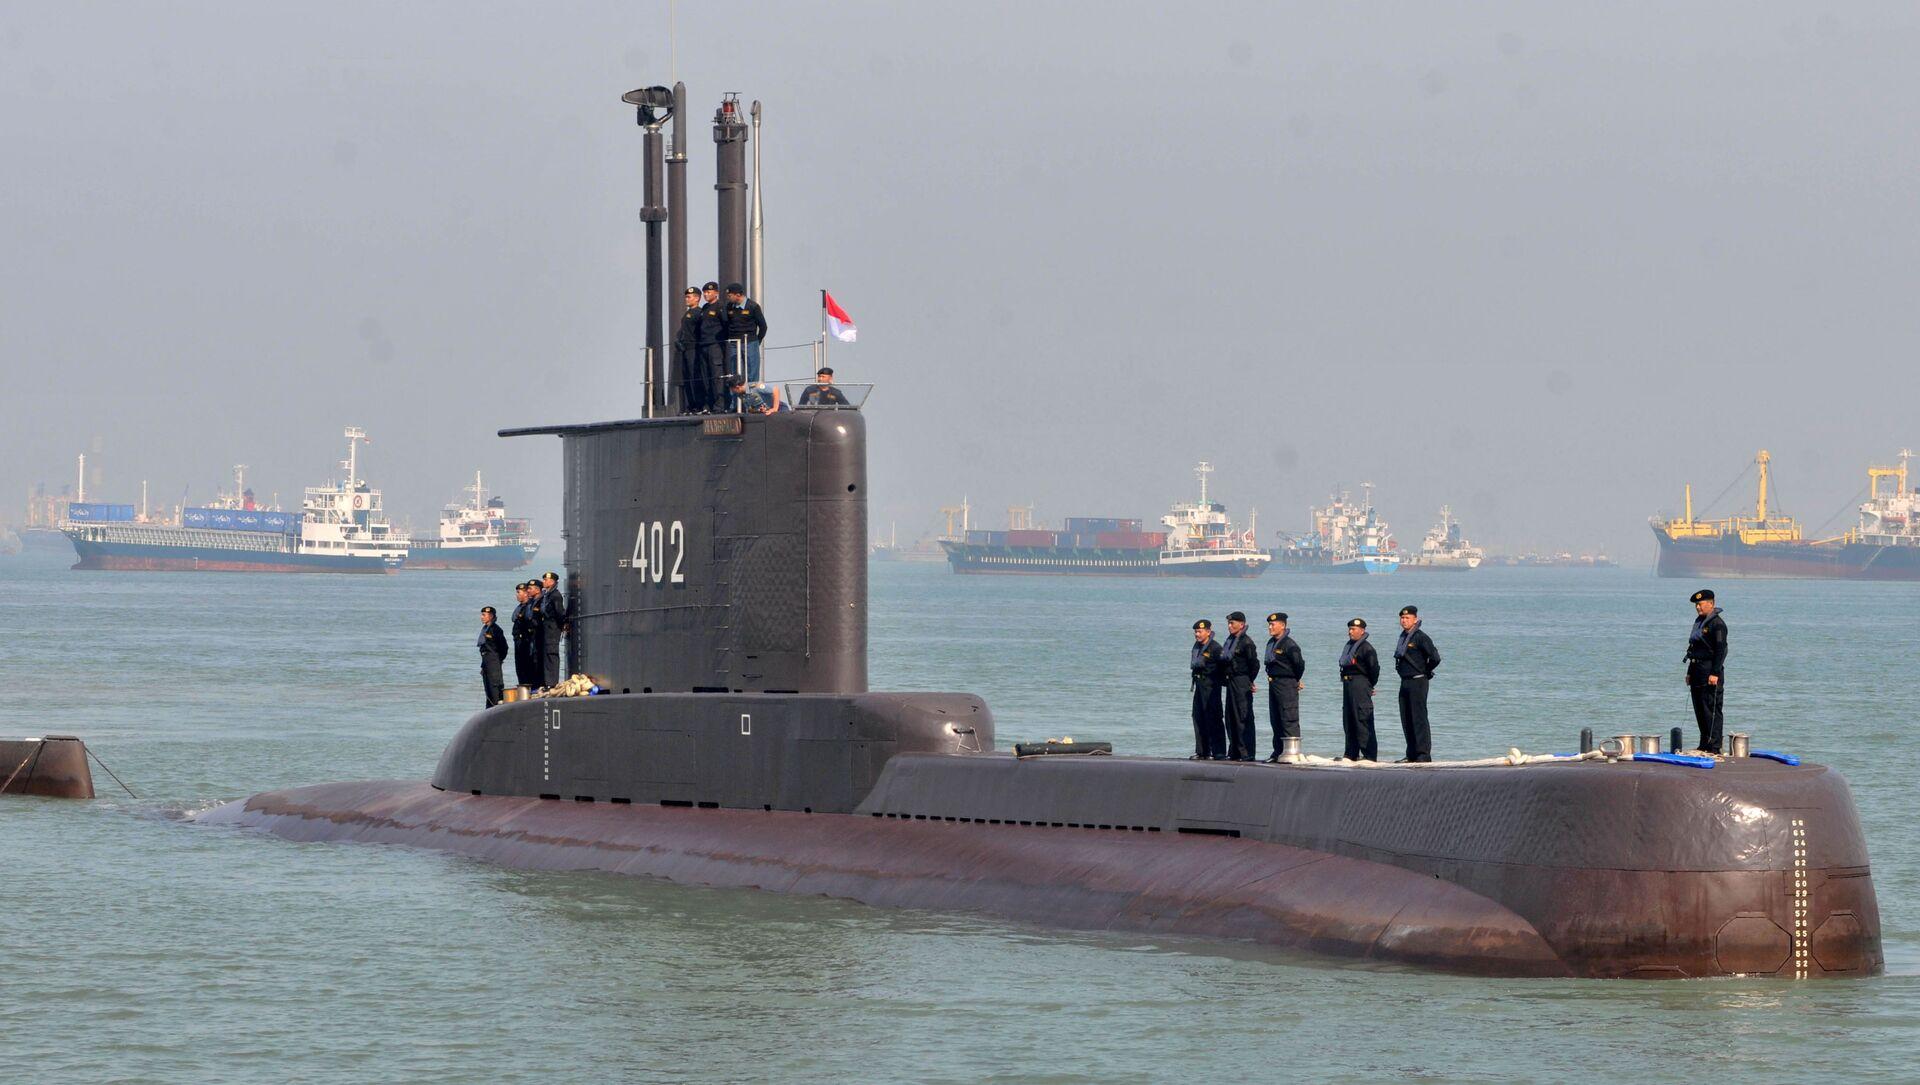 Il sottomarino indonesiano KRI Nanggala-402  - Sputnik Italia, 1920, 25.04.2021